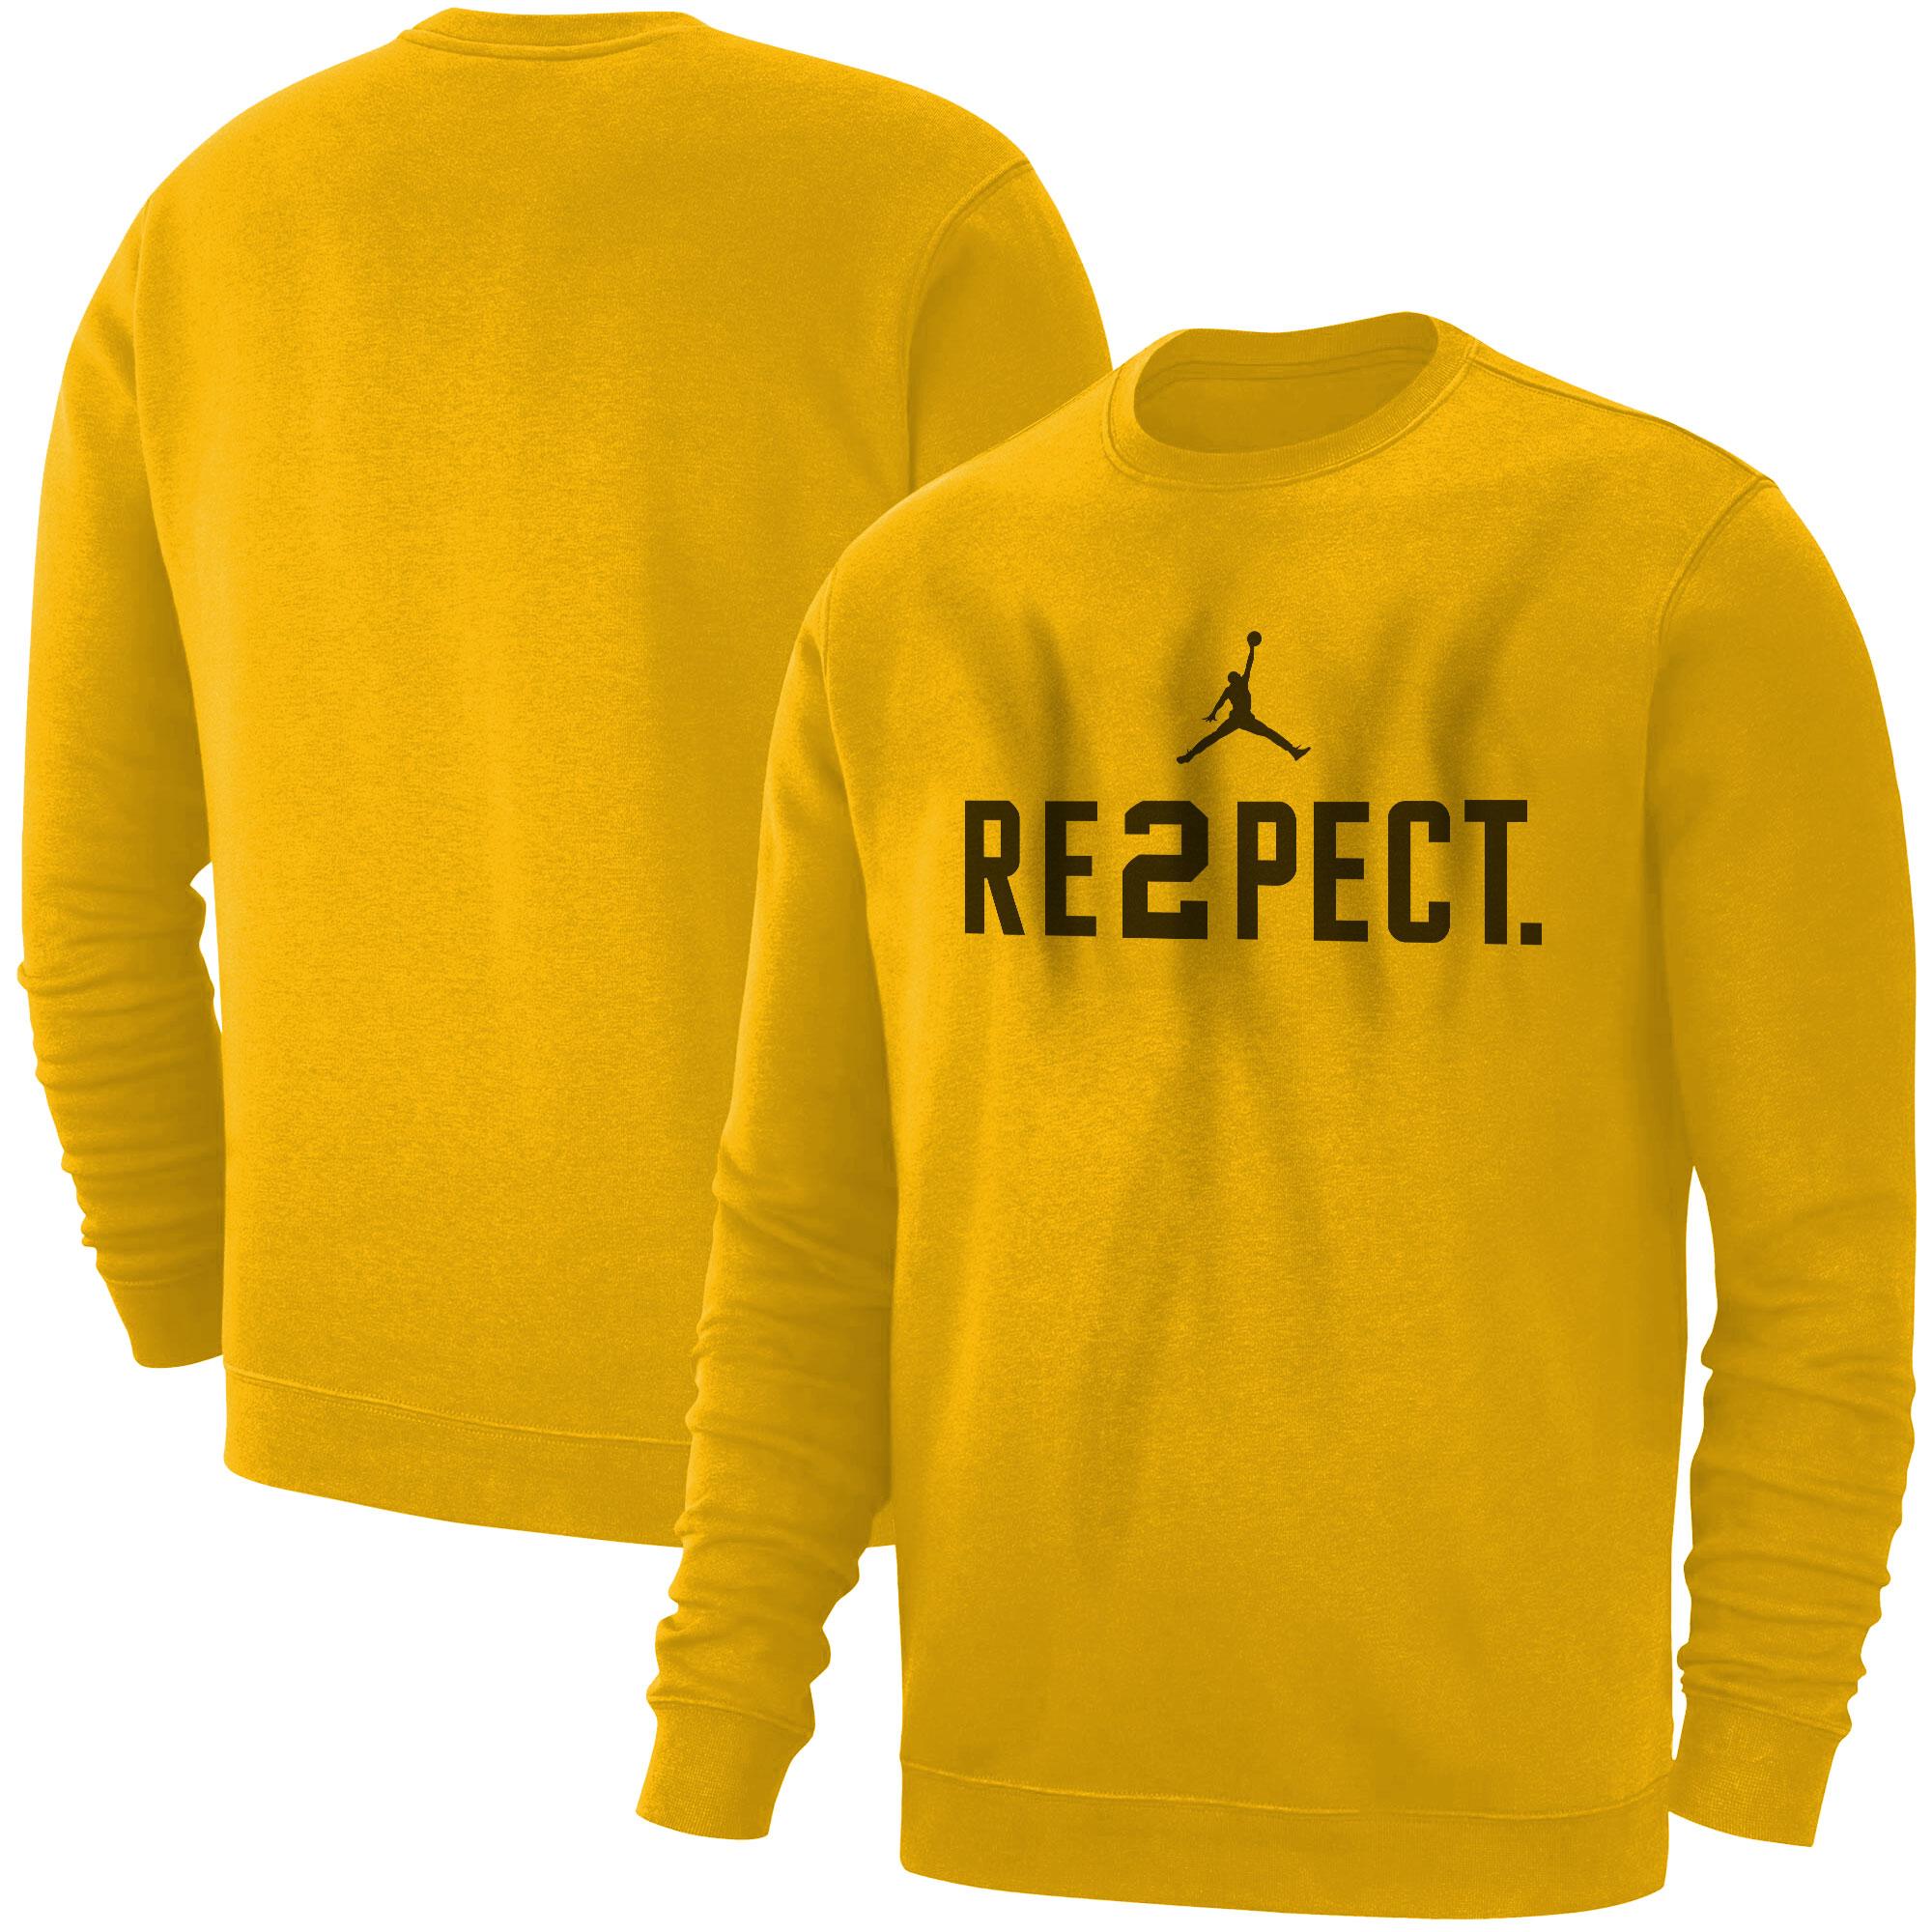 RE2PECT. BASIC (BSC-YLW-NP-112-Respect-Siyah)